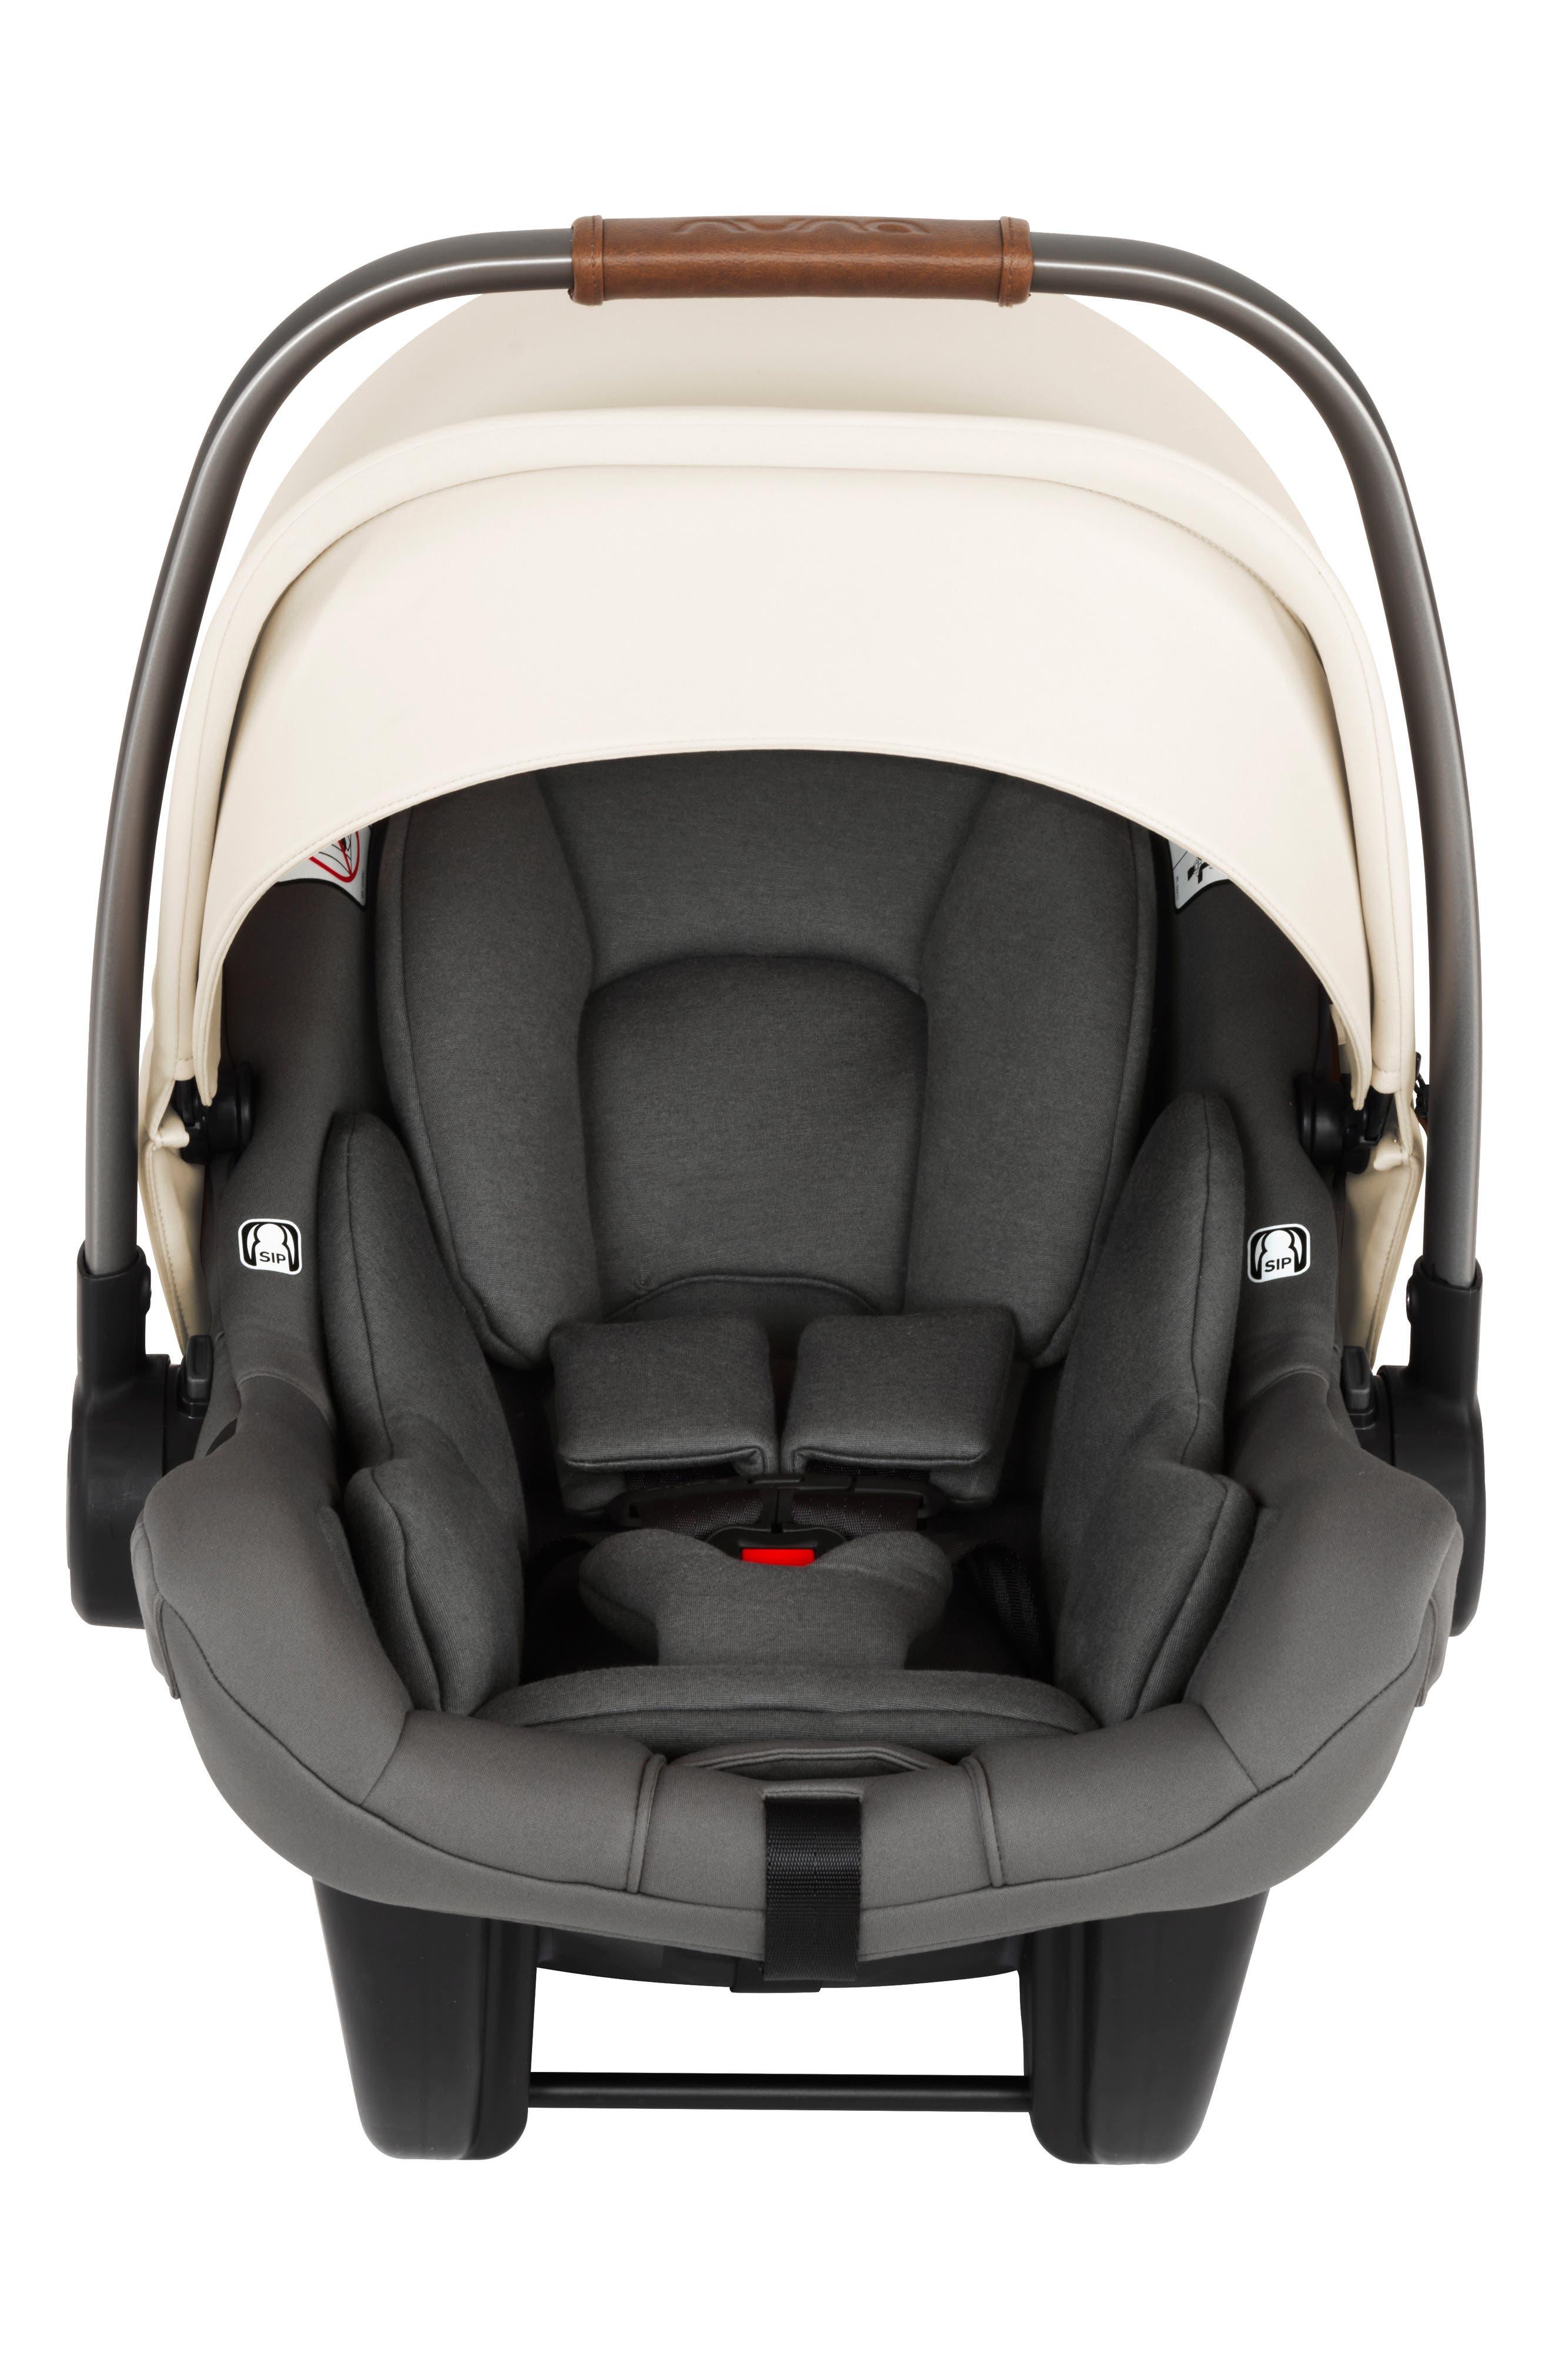 Car Seats: Booster Seats, Baby Car Seats